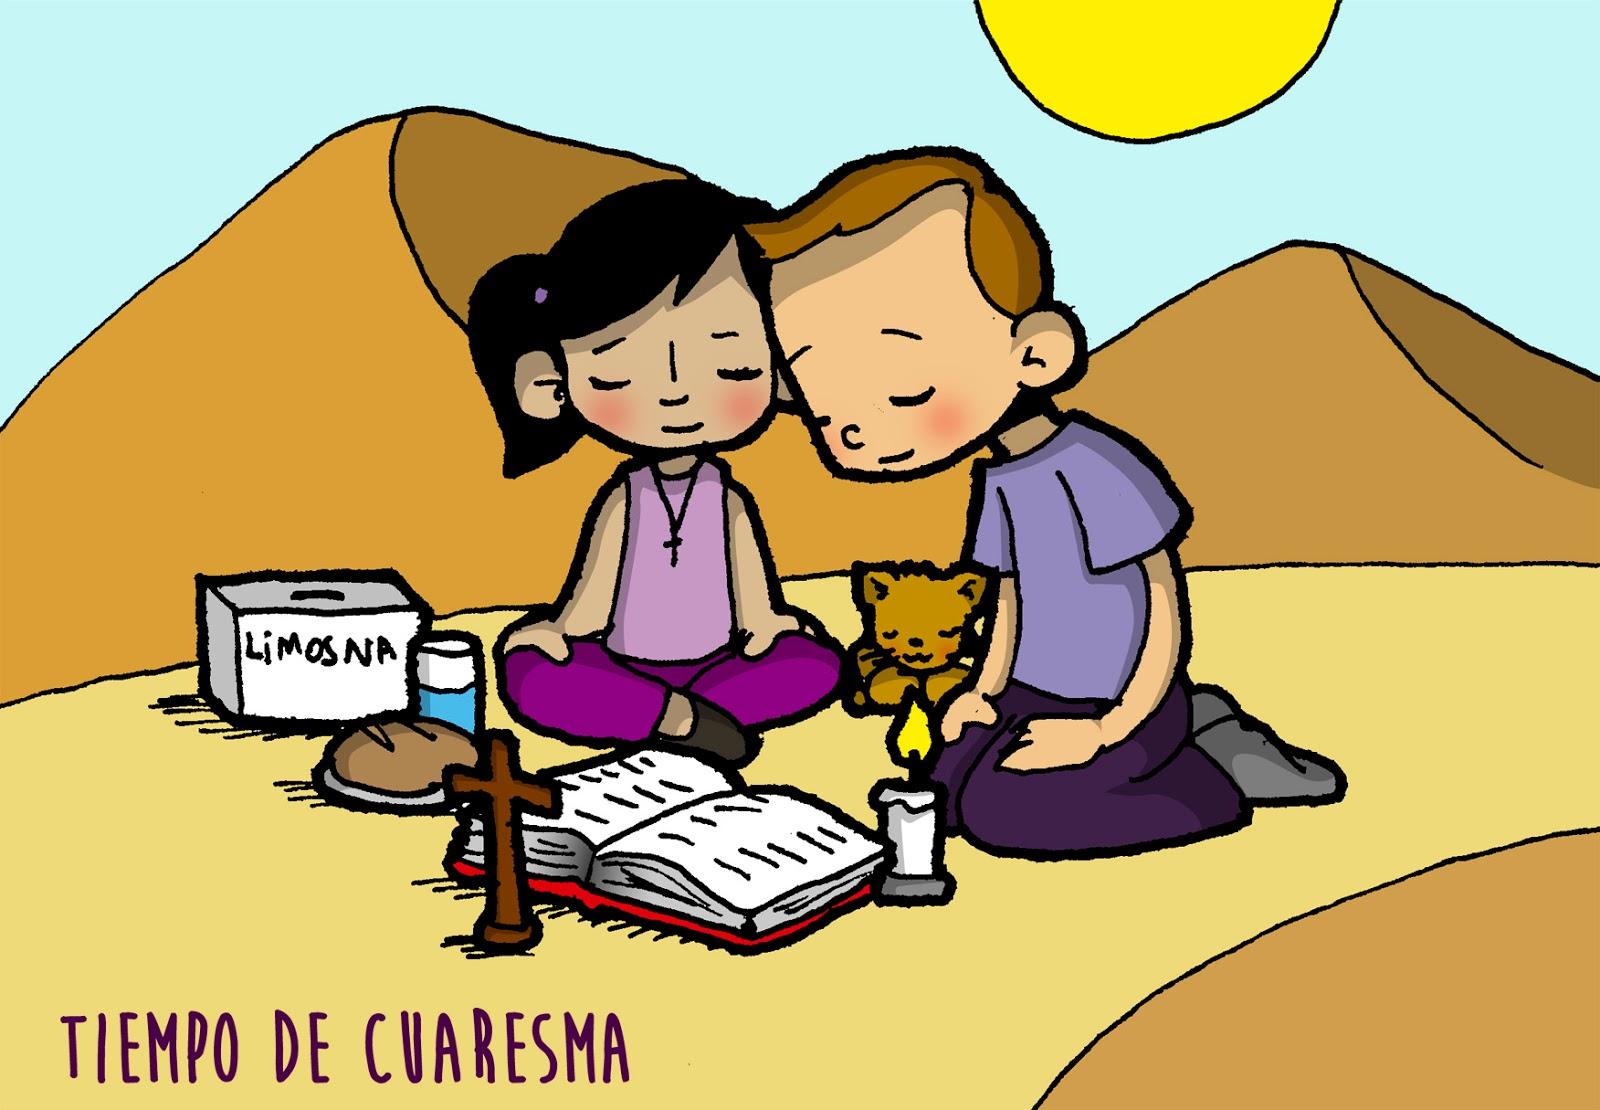 Dibujos para catequesis: TIEMPO DE CUARESMA